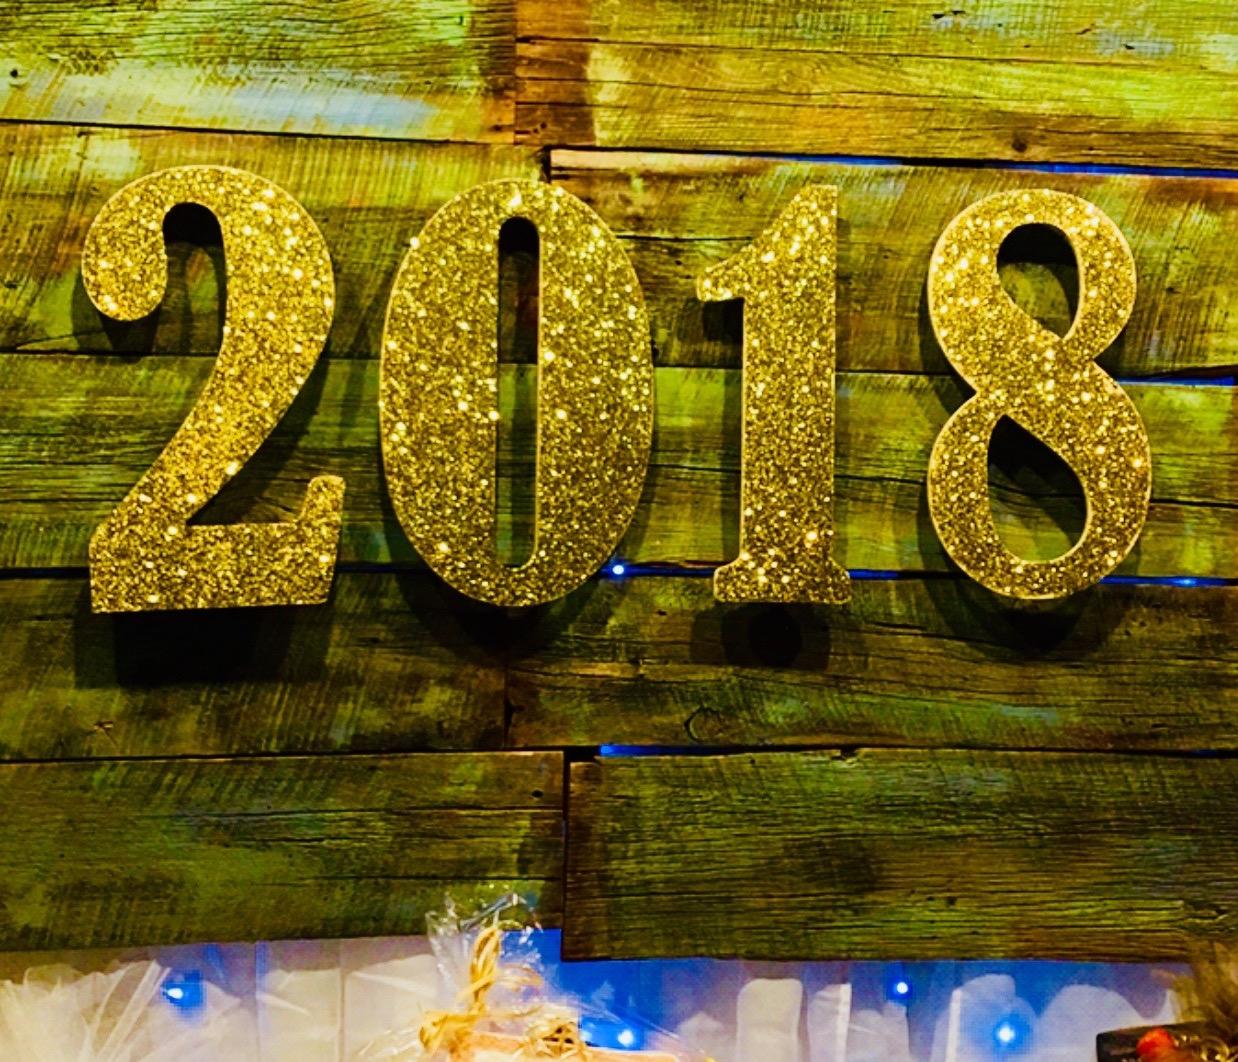 2ft x 2ft wooden 2018